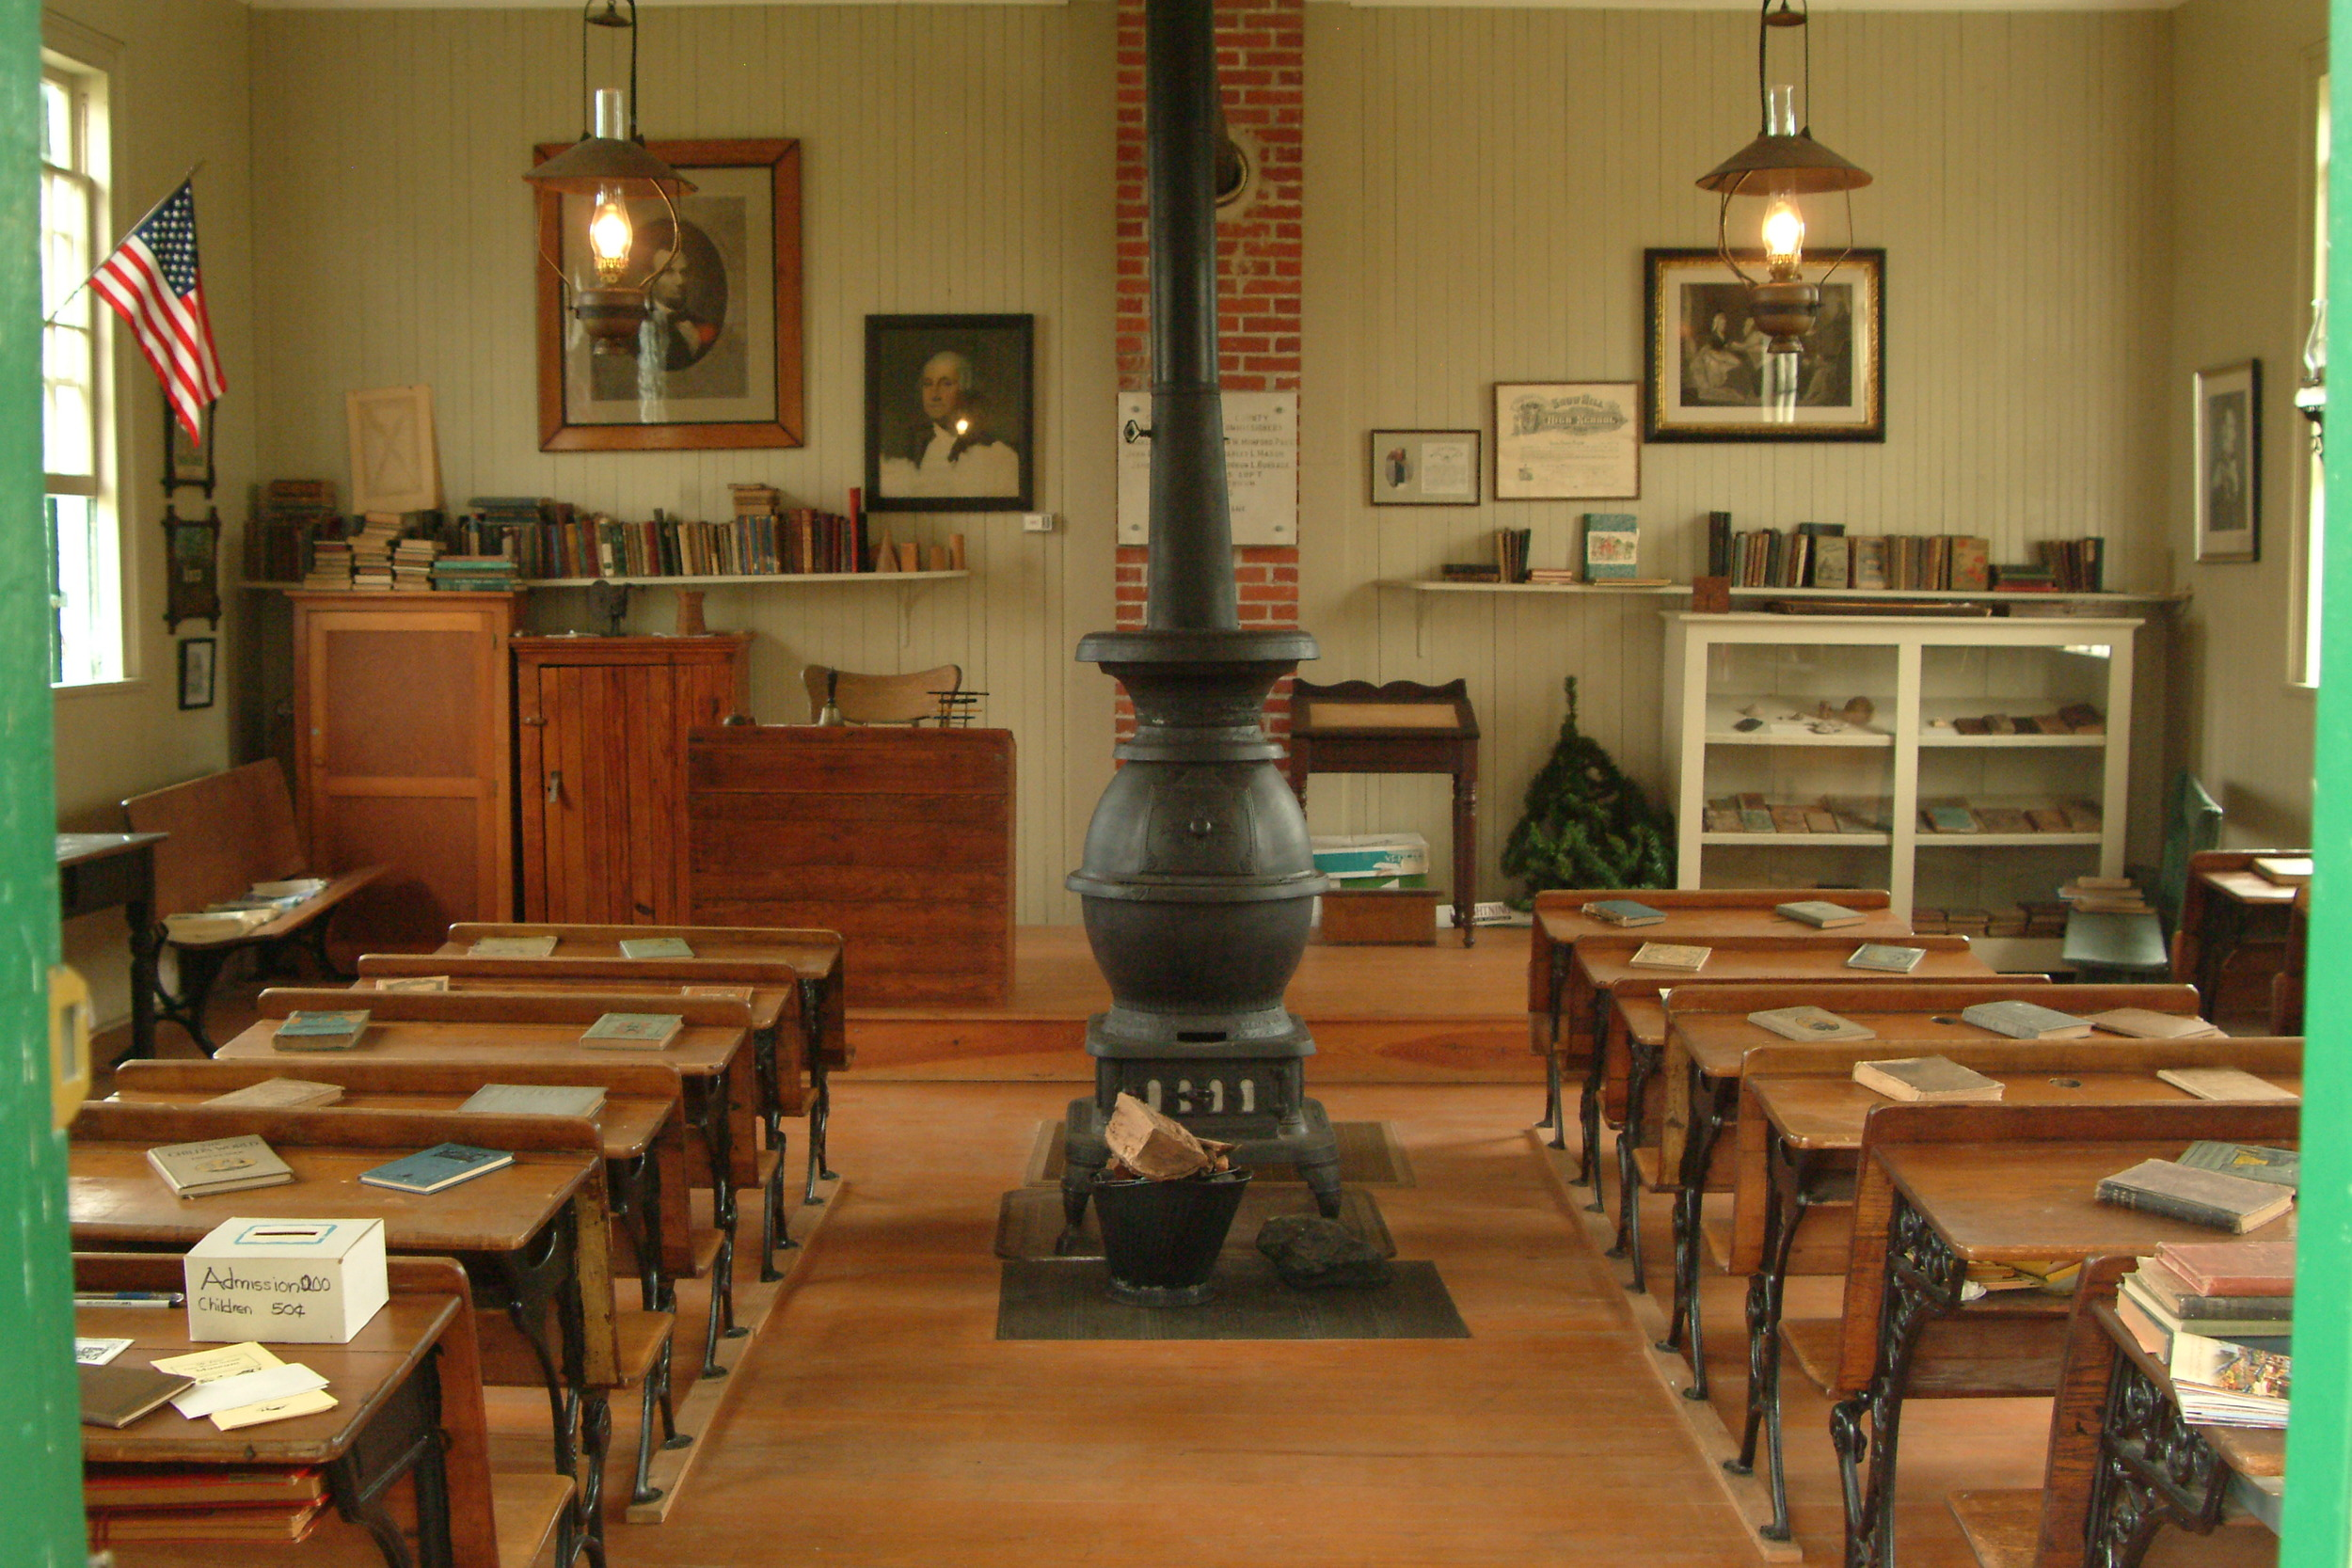 Mt. Zion One-room Schoolhouse